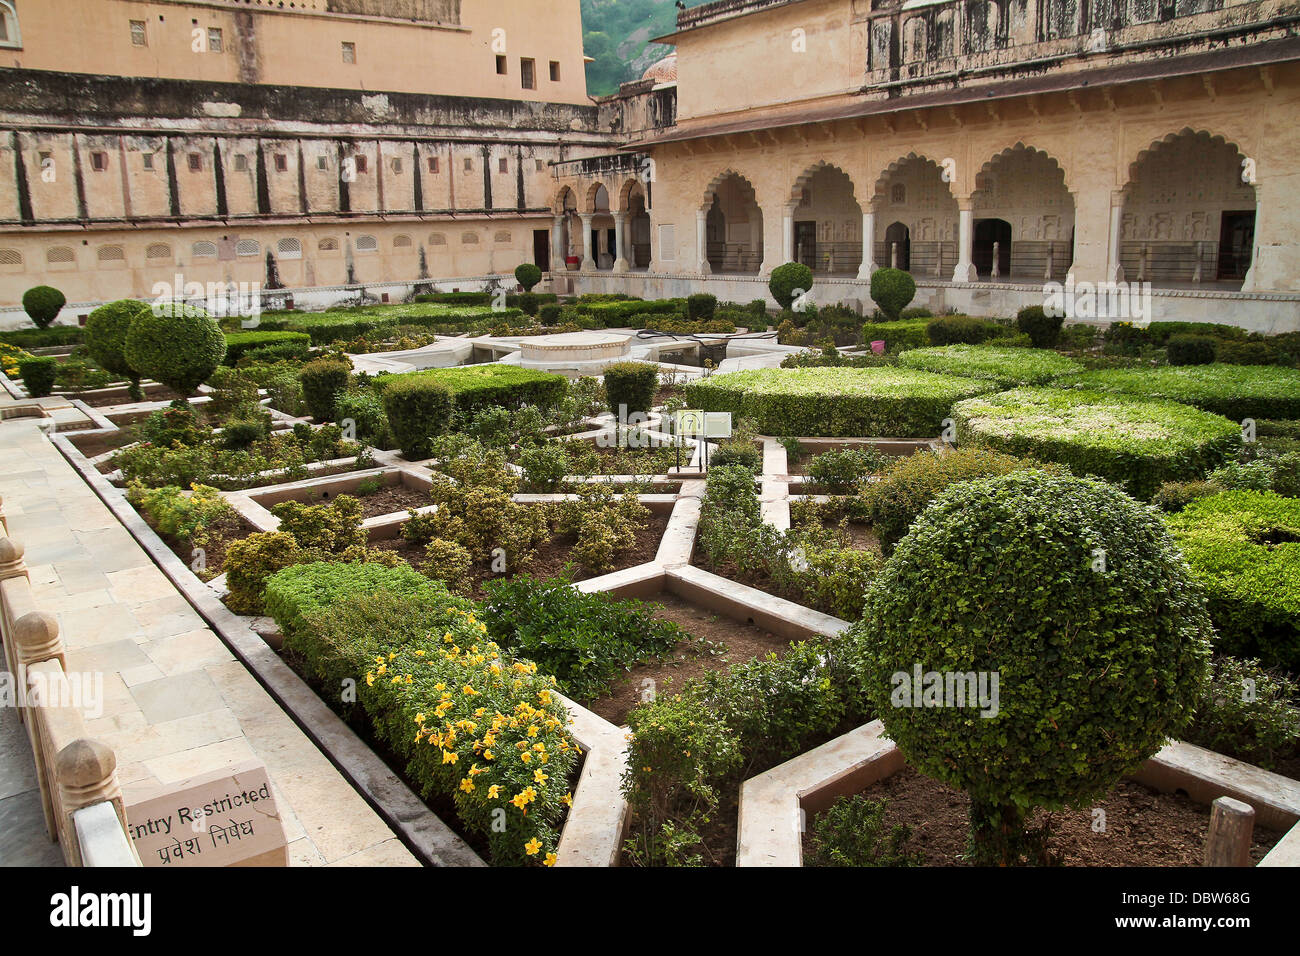 Amer Fort gardens in Jaipur India Stock Photo: 58946064 - Alamy